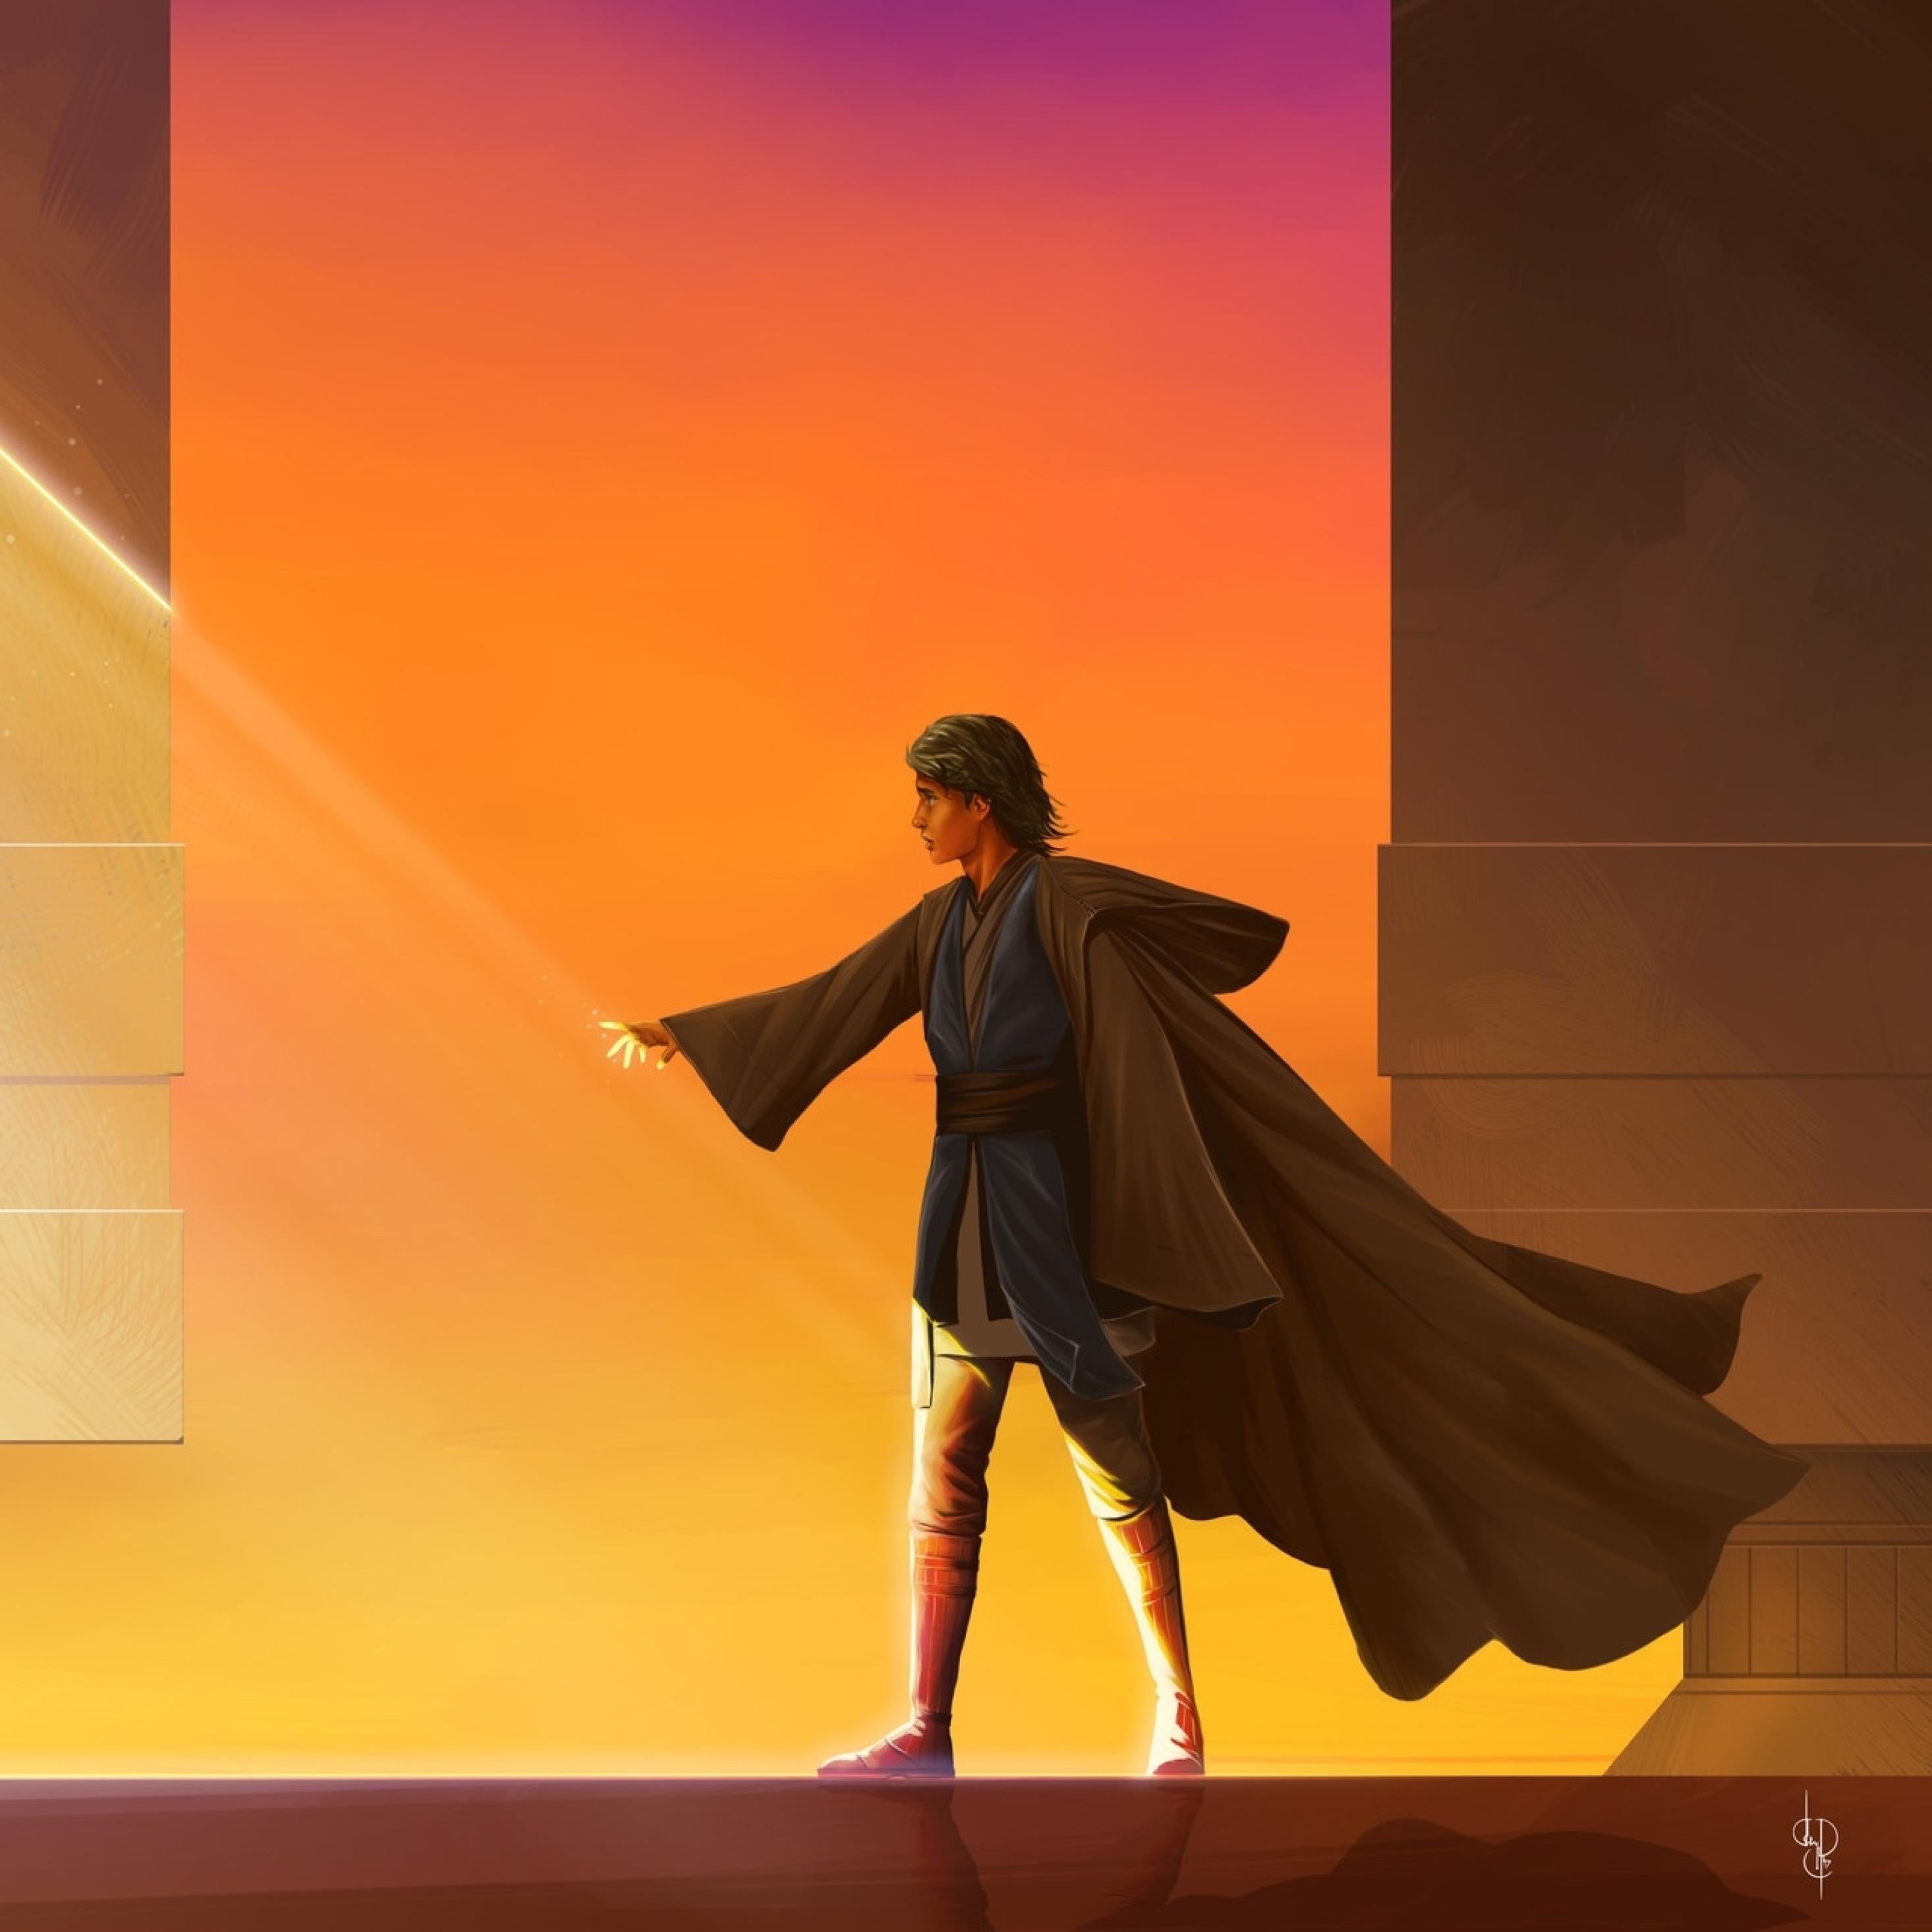 2932x2932 Ahsoka Tano And Anakin Skywalker Art Ipad Pro Retina Display Wallpaper Hd Artist 4k Wallpapers Images Photos And Background